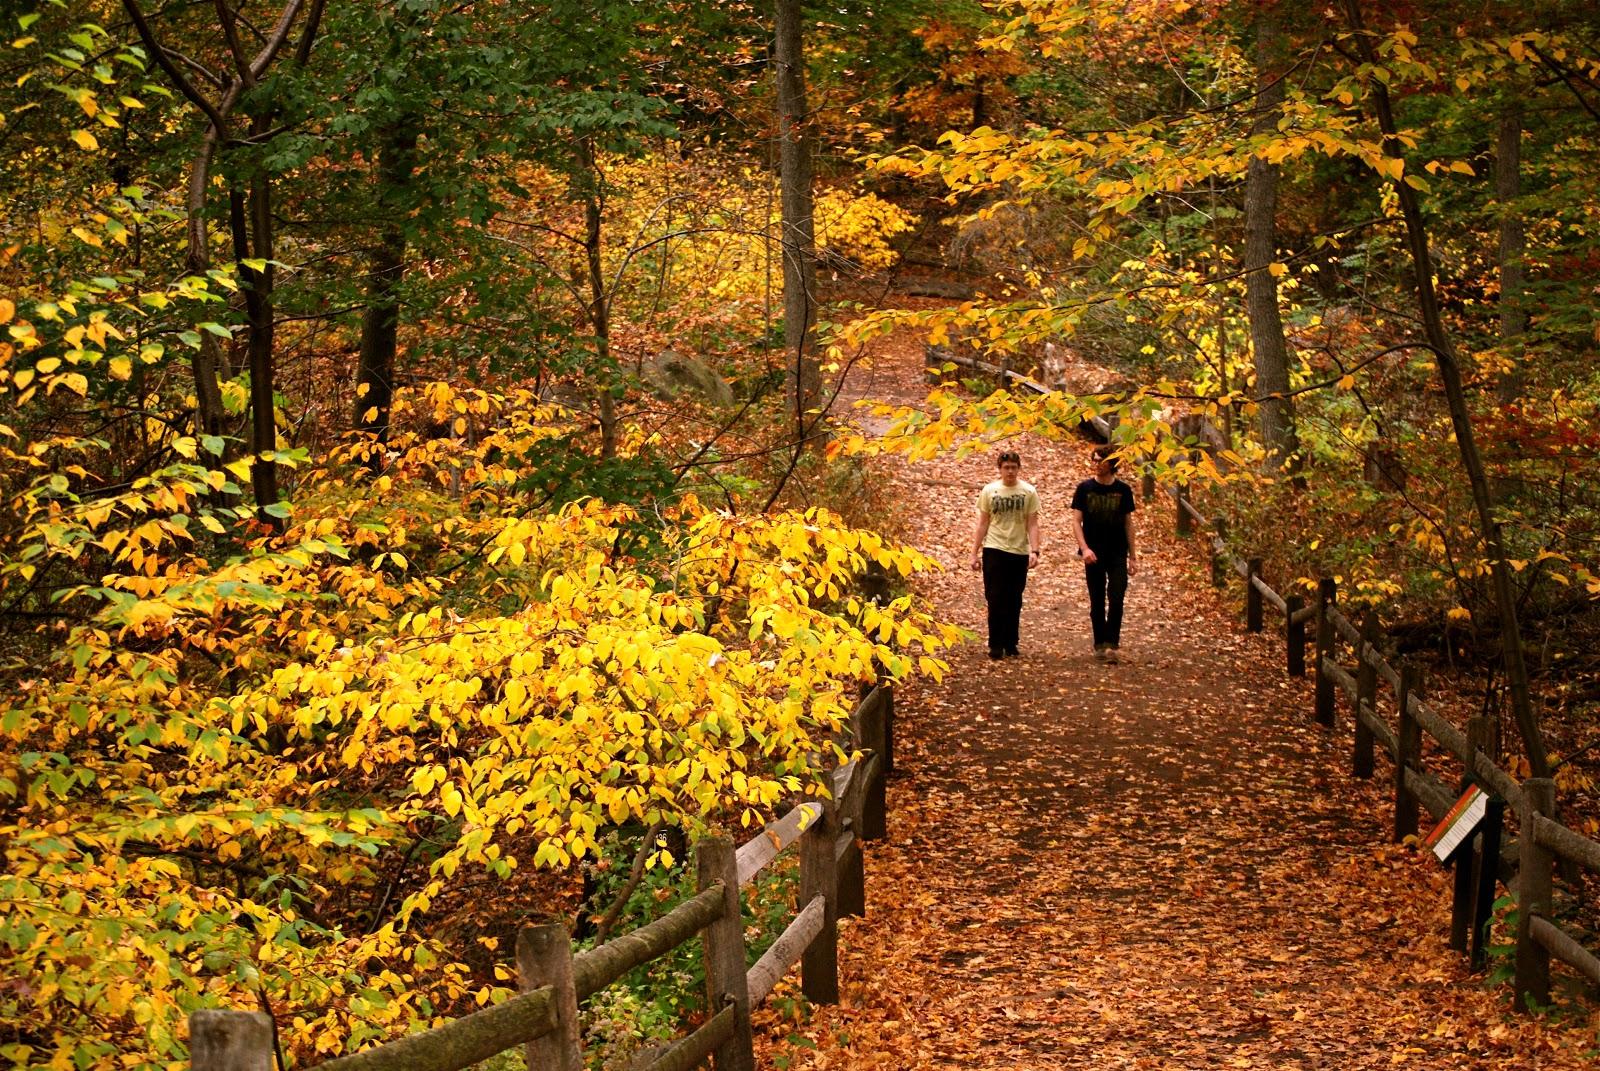 NYC ♥ NYC: Autumn Foliage at the New York Botanical Garden